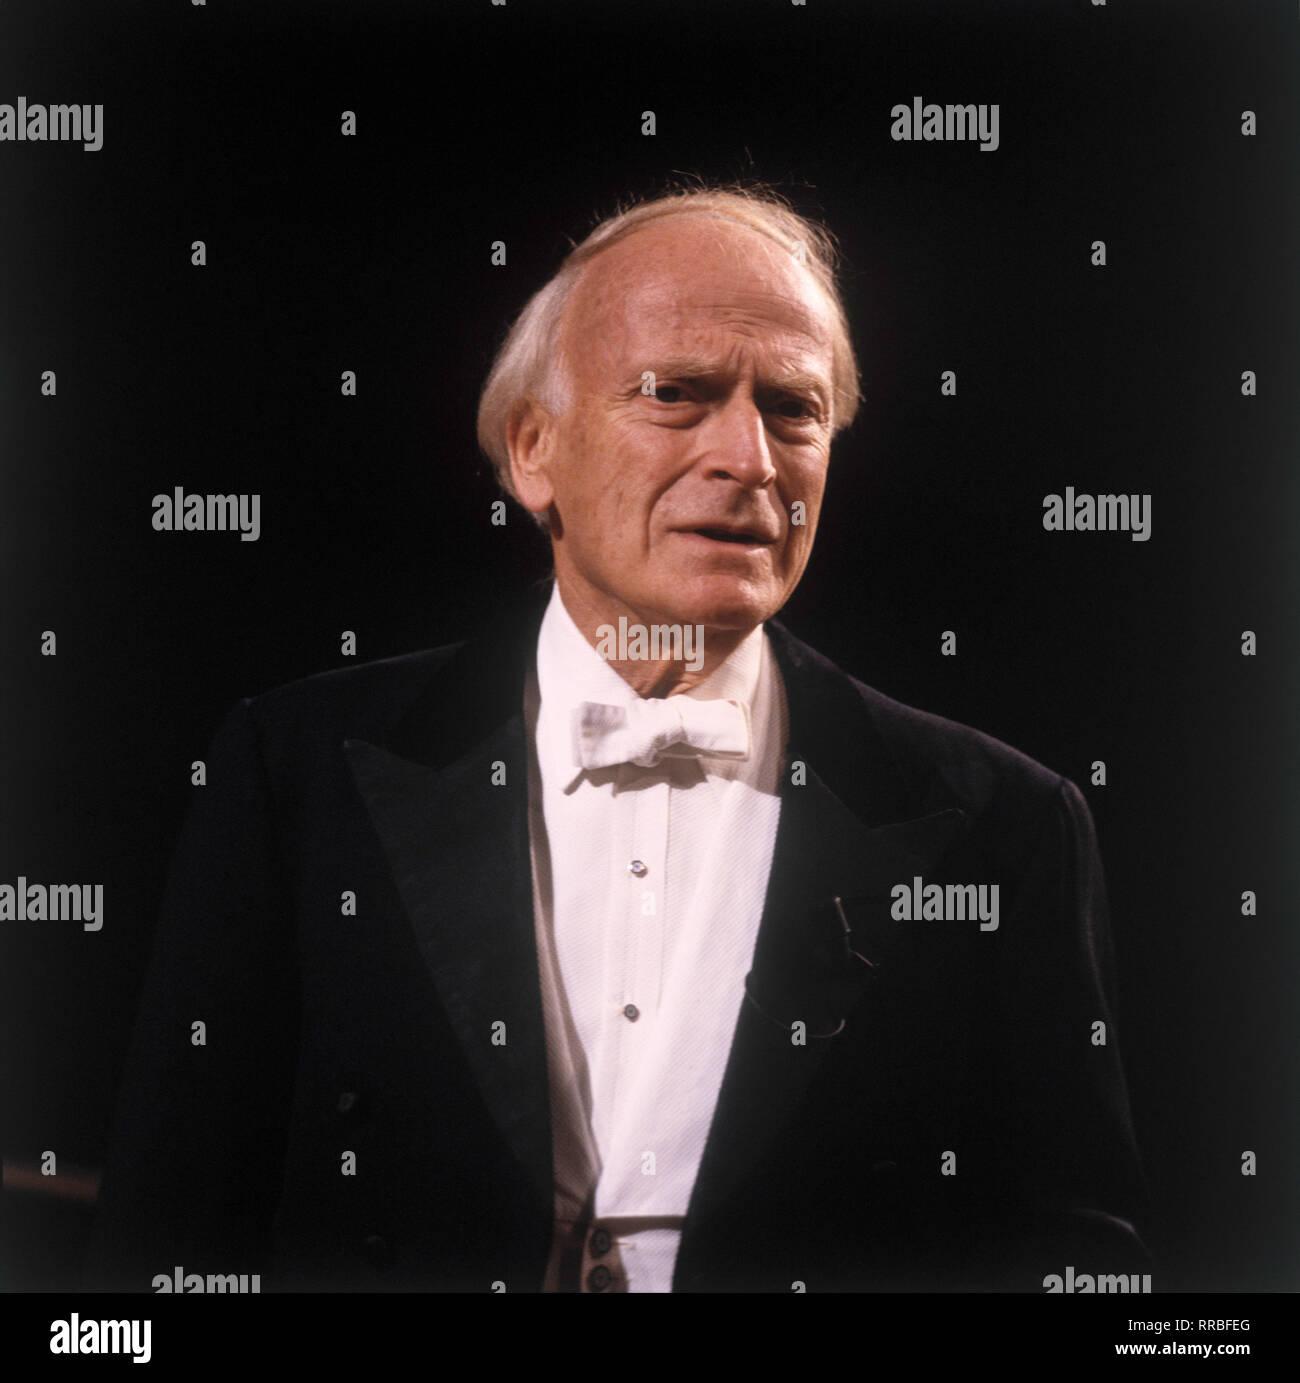 Der berühmte Geiger und Dirigent Yehudi Menuhin, 1987. Famous Violinist and conductor Yehudi Menuhin, 1987. / Überschrift: Yehudi Menuhin - Stock Image